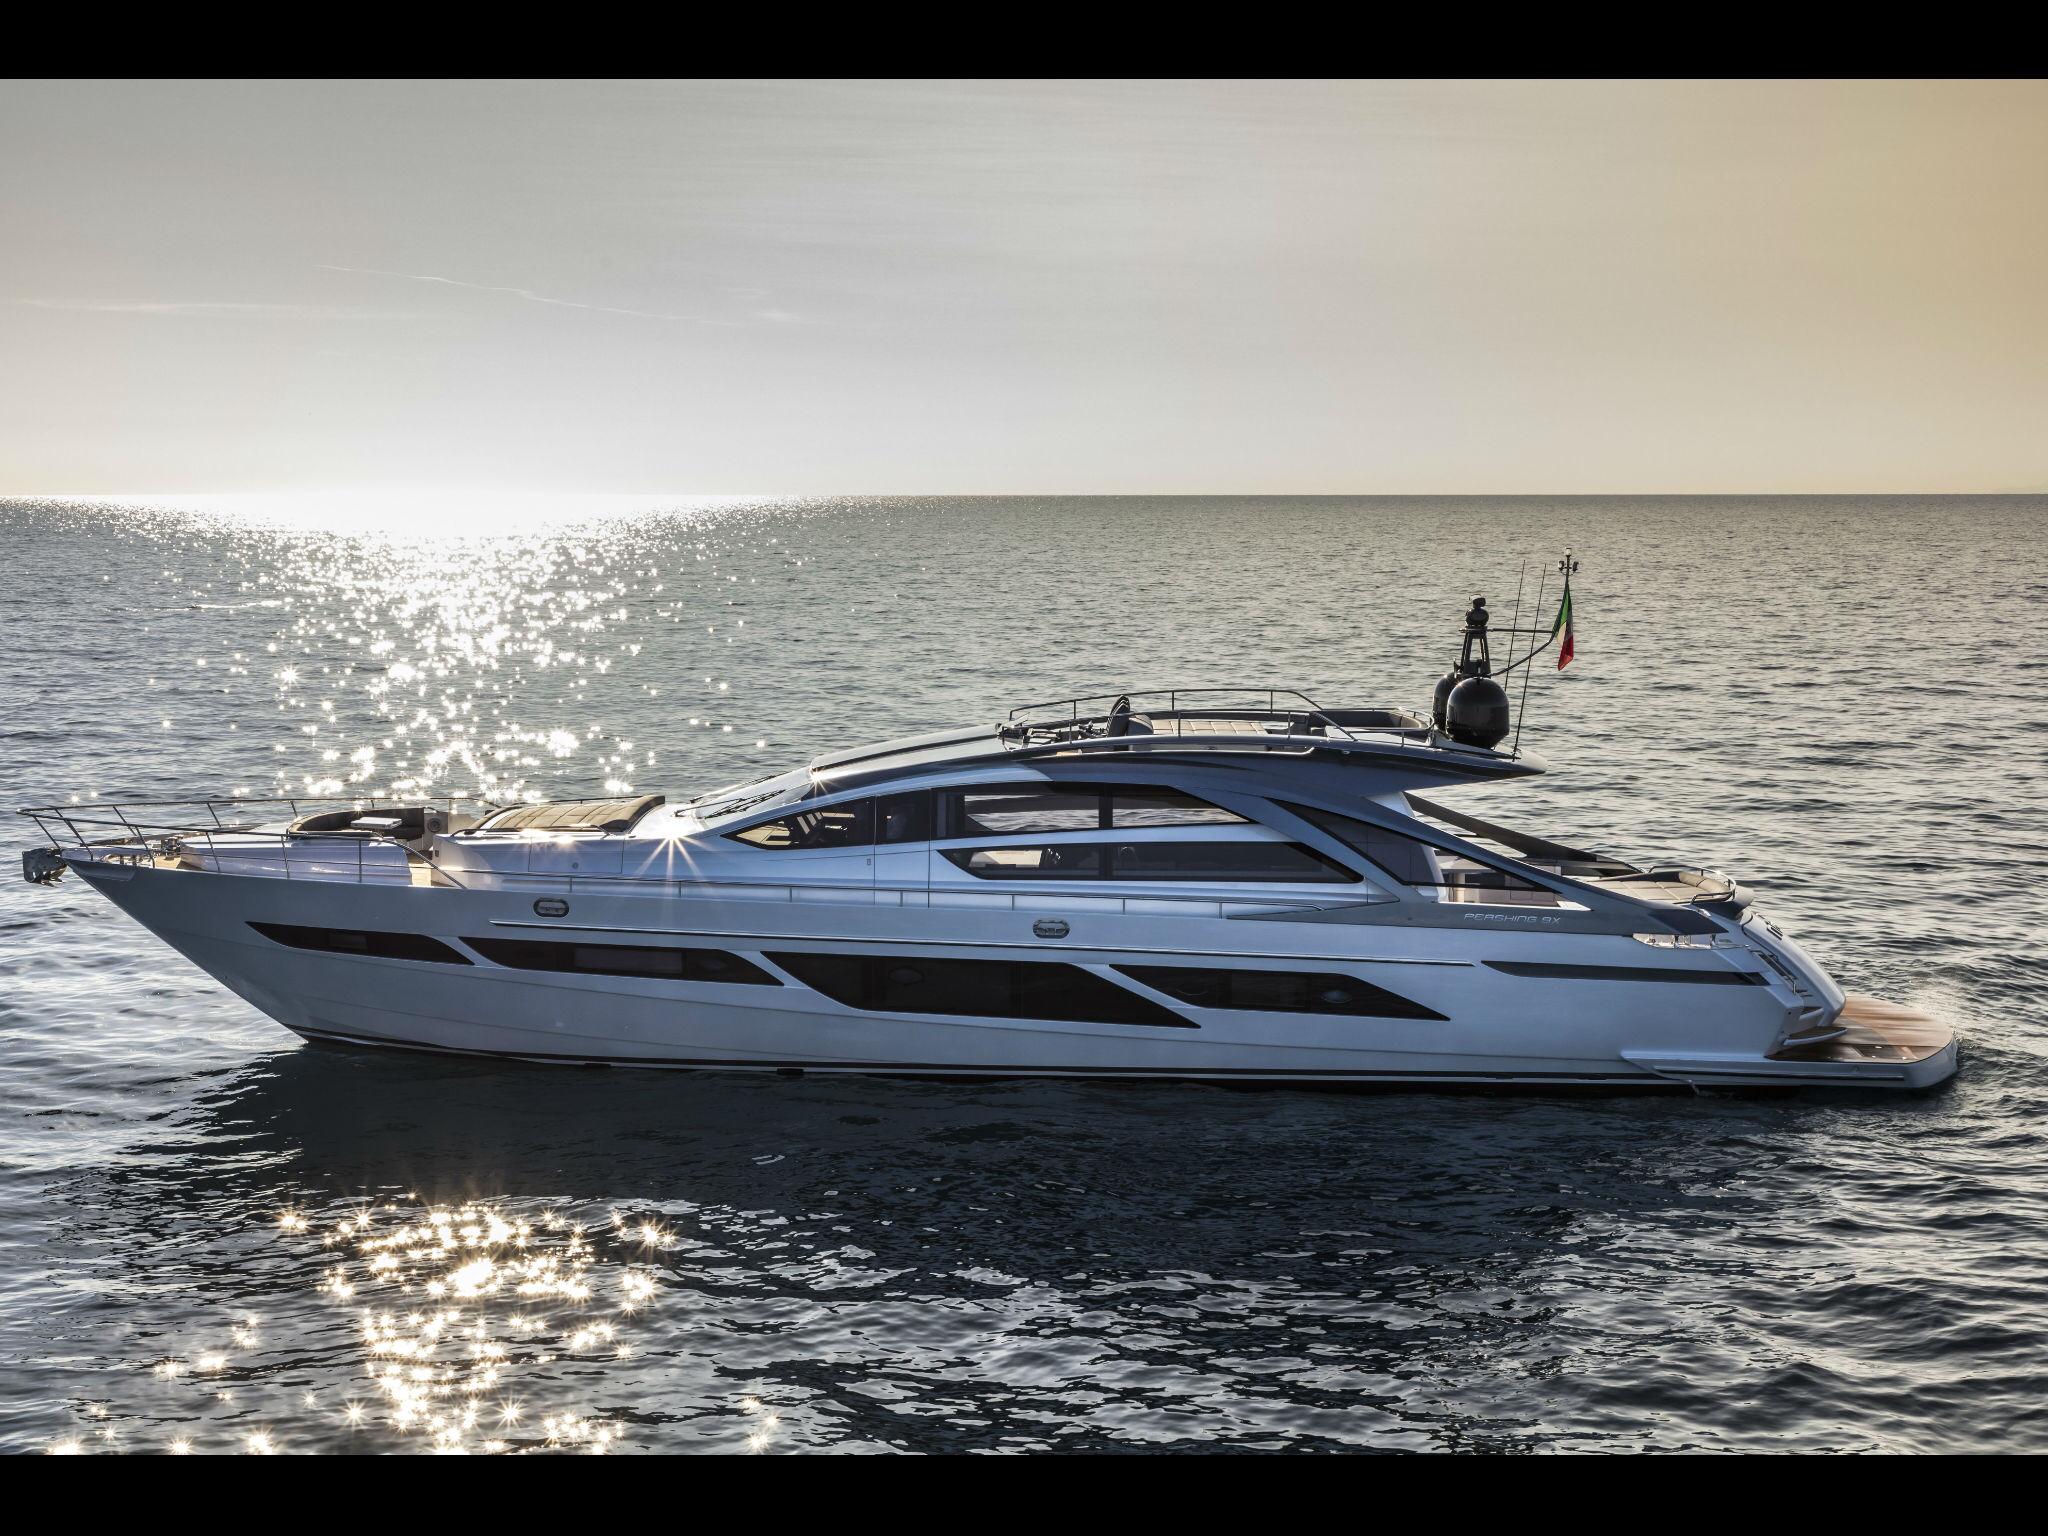 ferretti yachts ferretti group pershing yachts pershing 9X JMA Yachting Port Fréjus Var vente location neuf occasion places de p